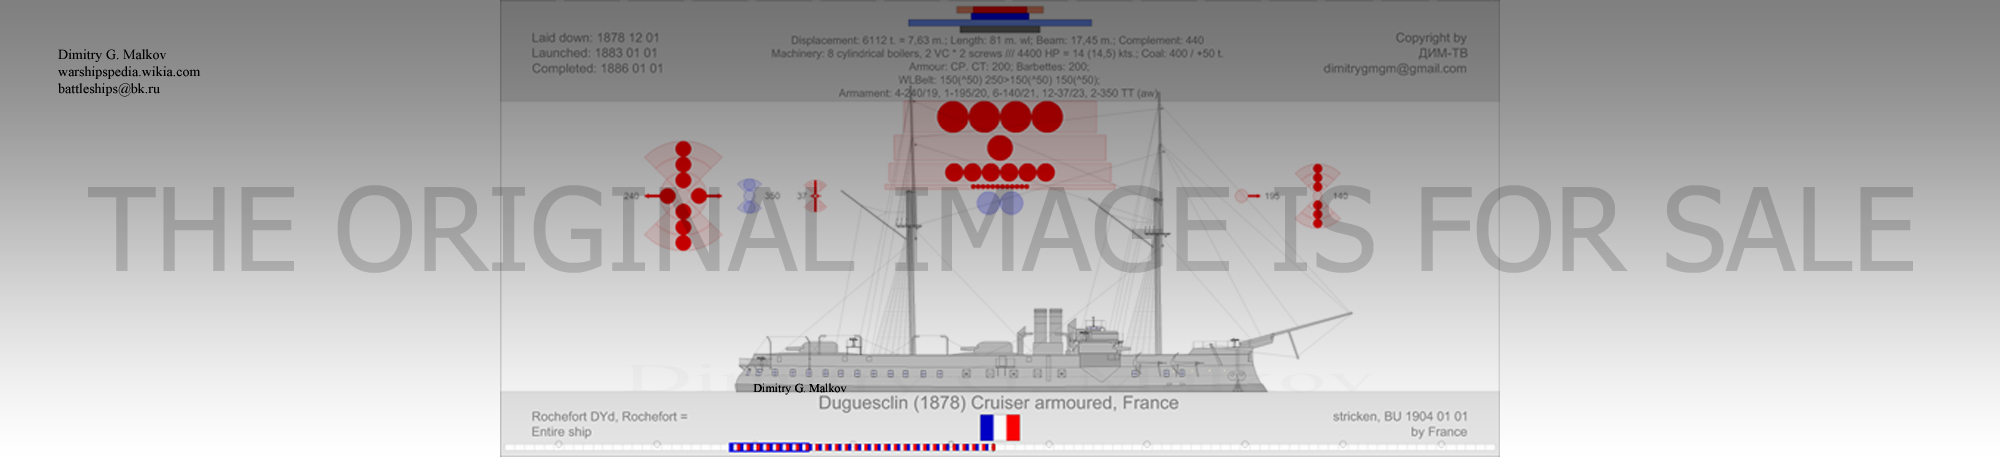 Mes dessins de navires français et de construction française - Page 2 Ca-18712